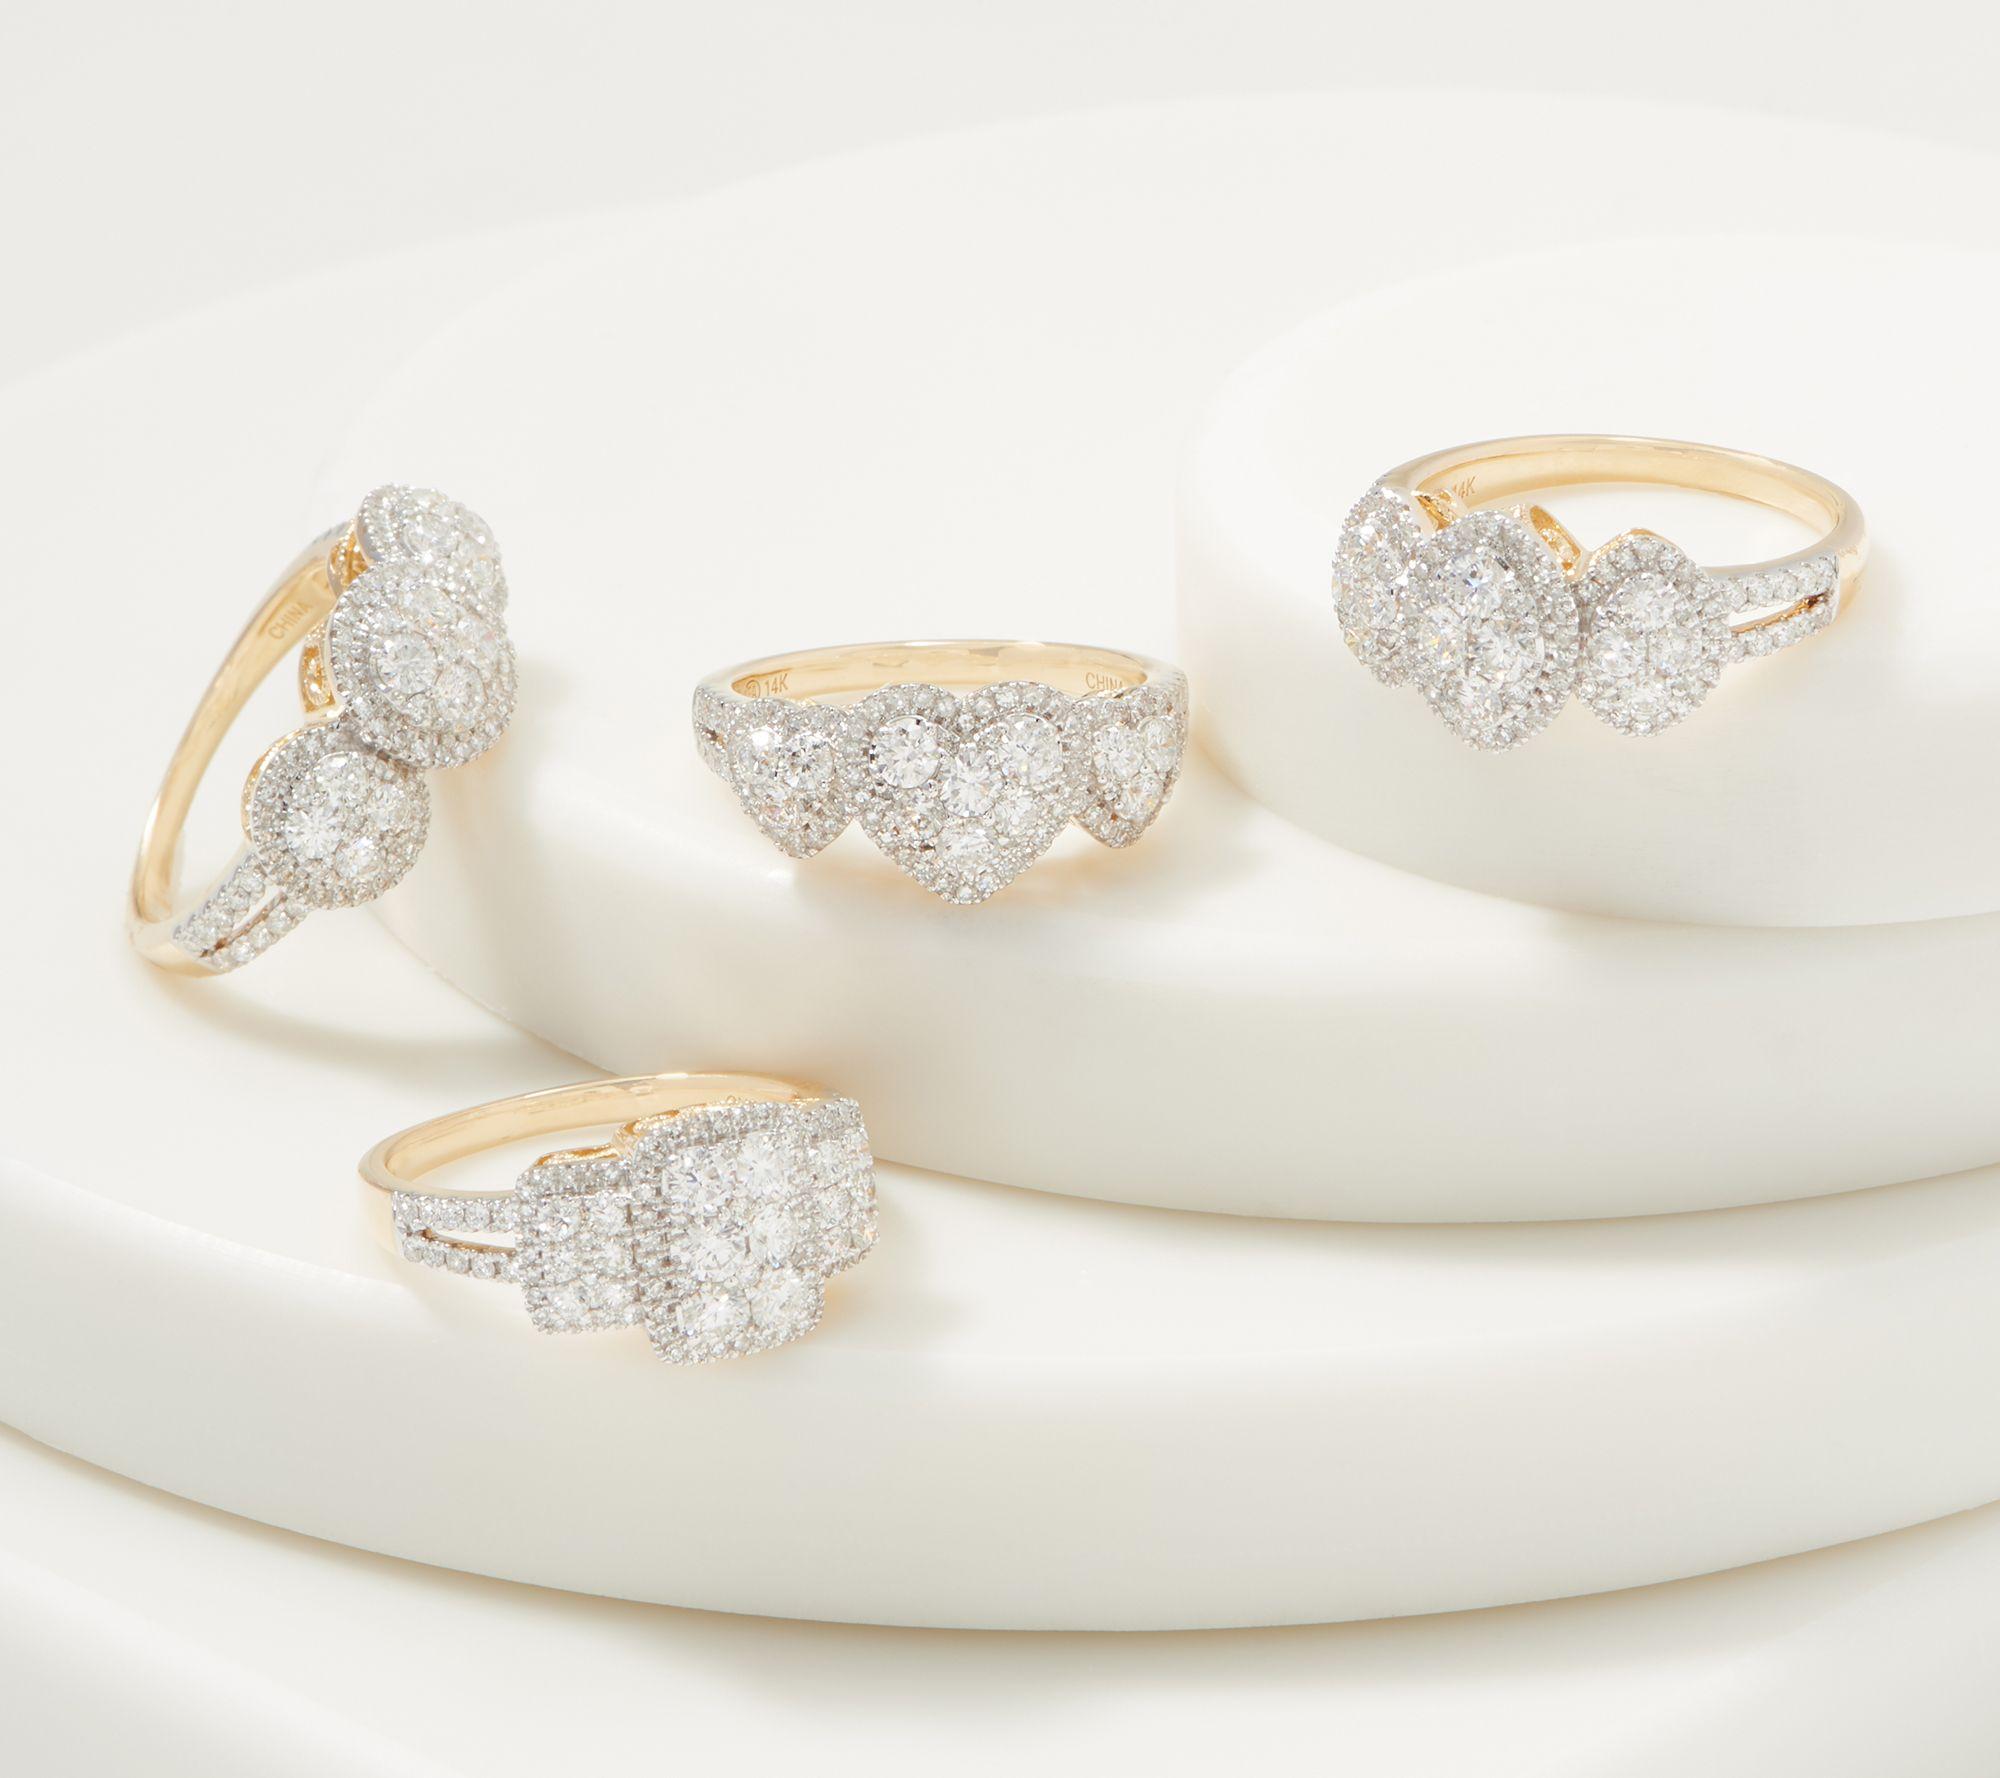 9f4117a38ff7e Affinity 14K Gold Triple Cluster Diamond Ring, 1.00cttw — QVC.com